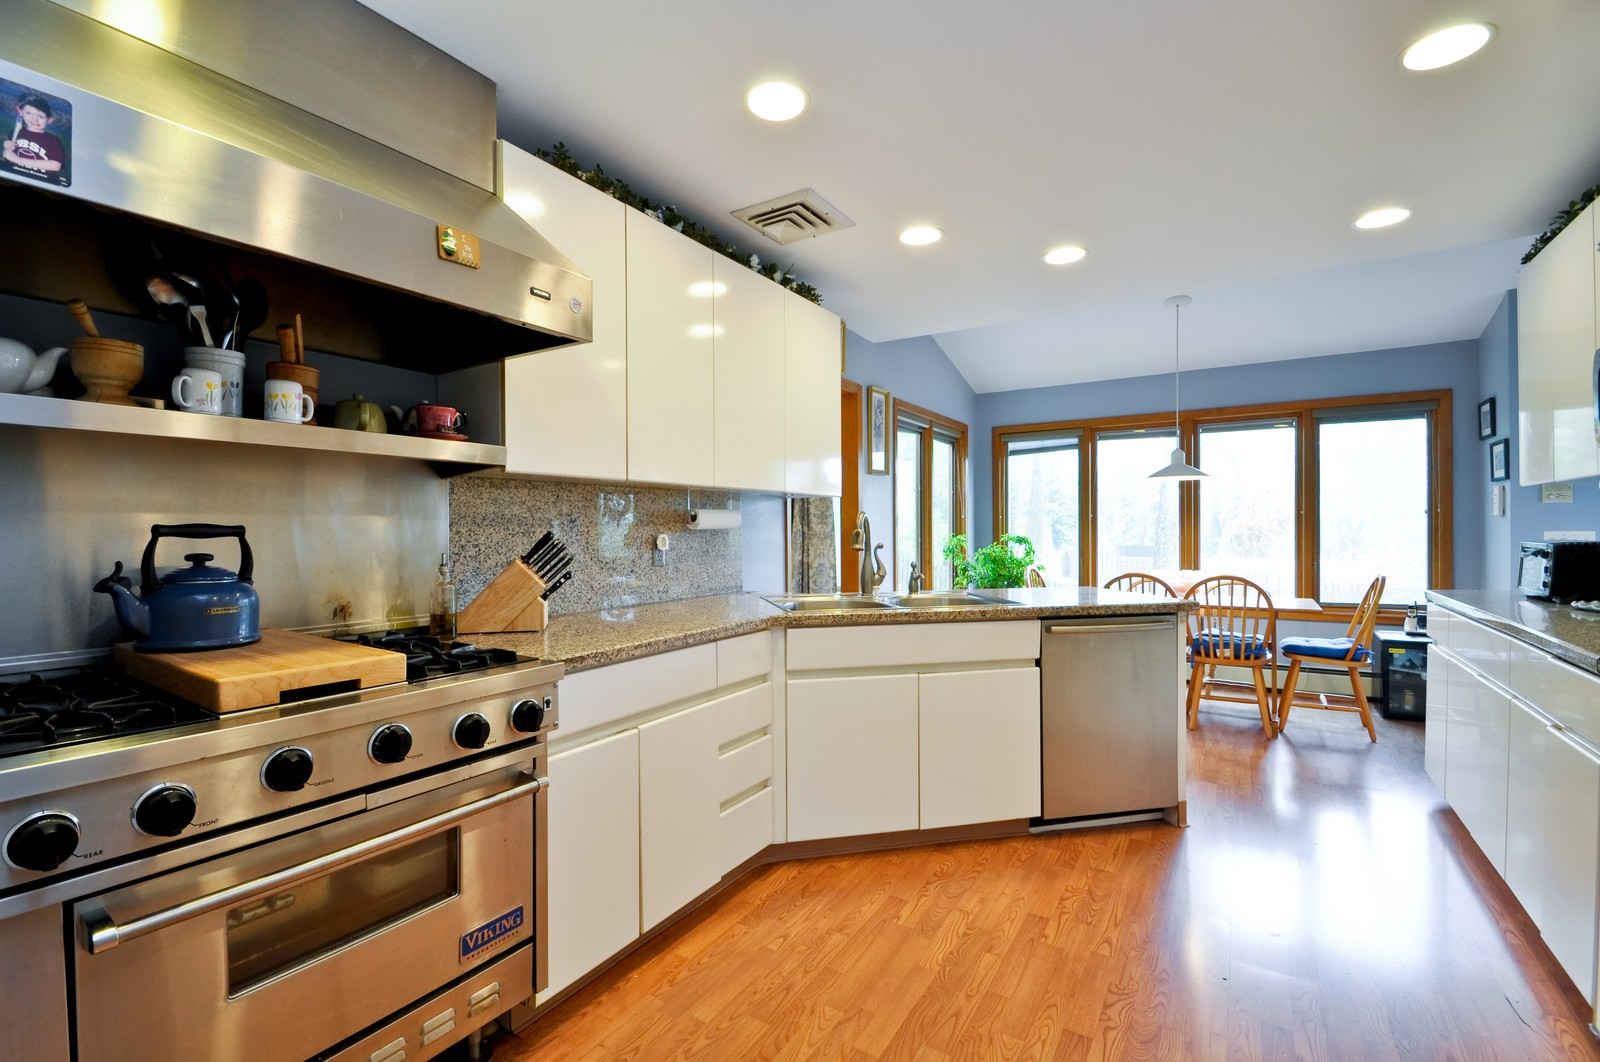 Kitchen Cabinets Verona Nj -  real estate photography 13 nassau rd verona nj 07044 kitchen